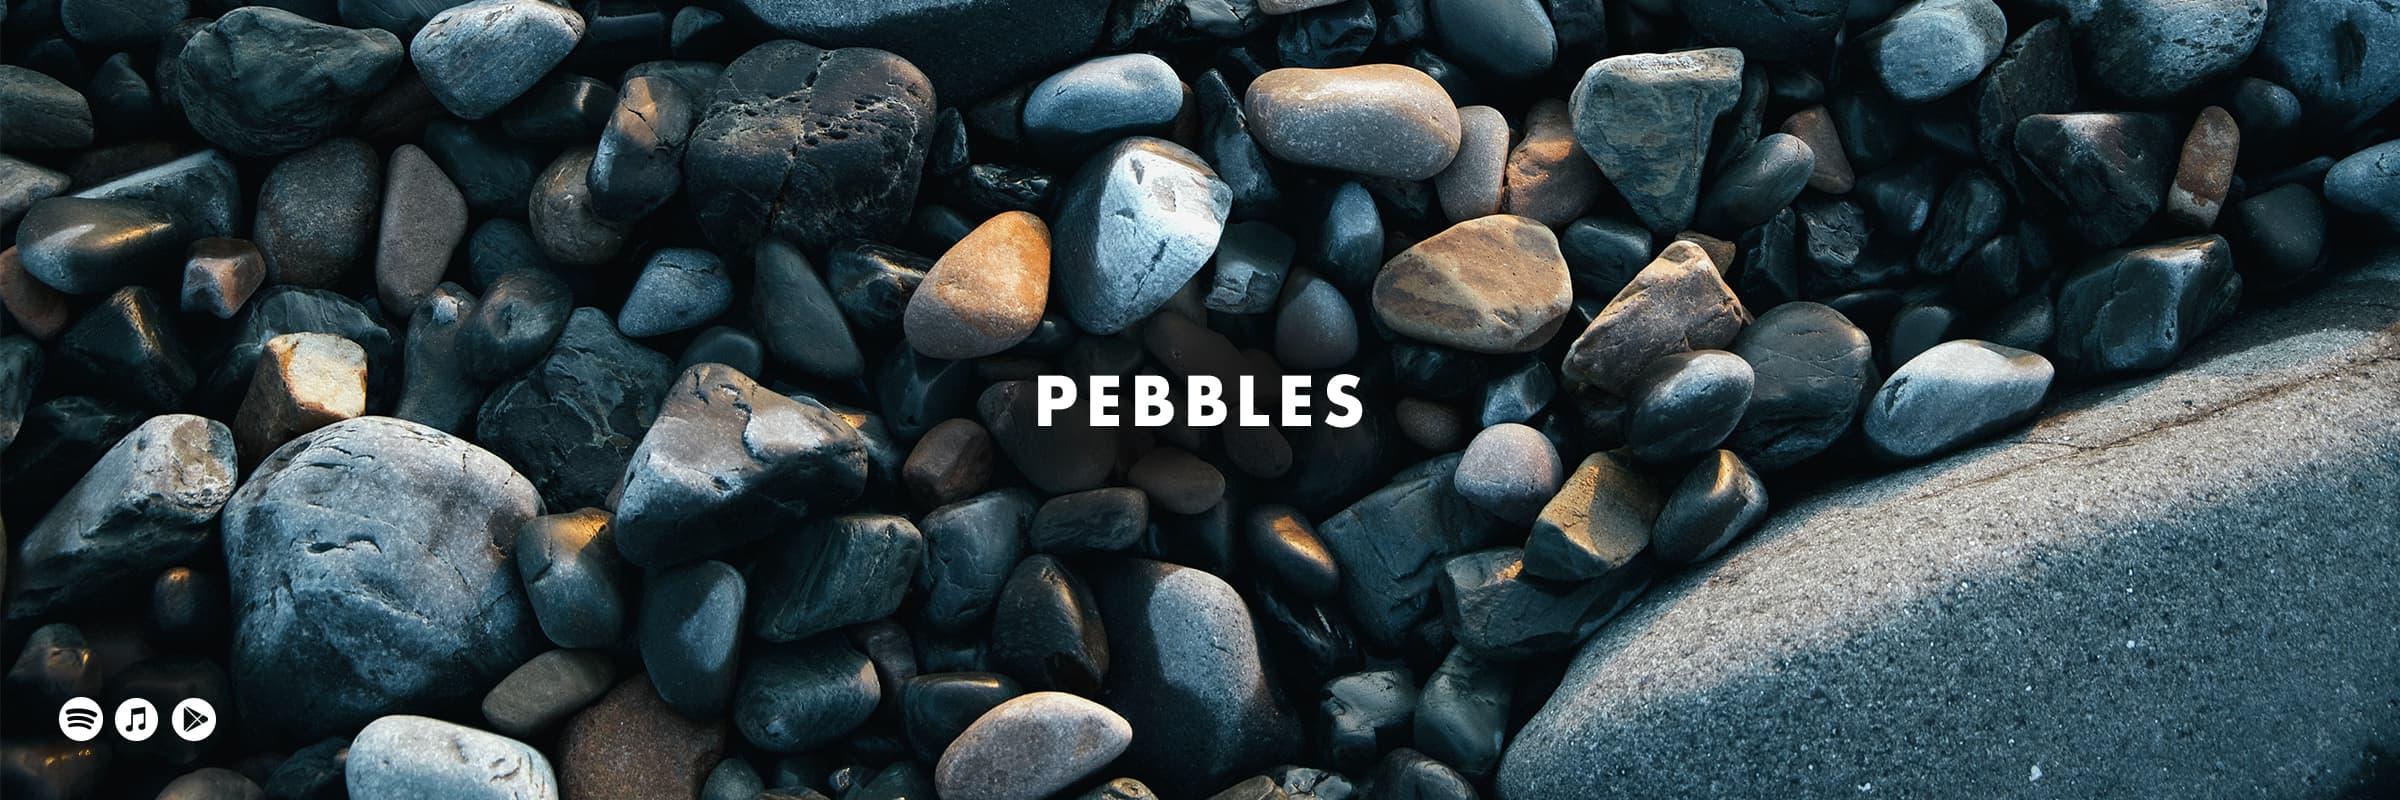 John Ozbay - Pebbles